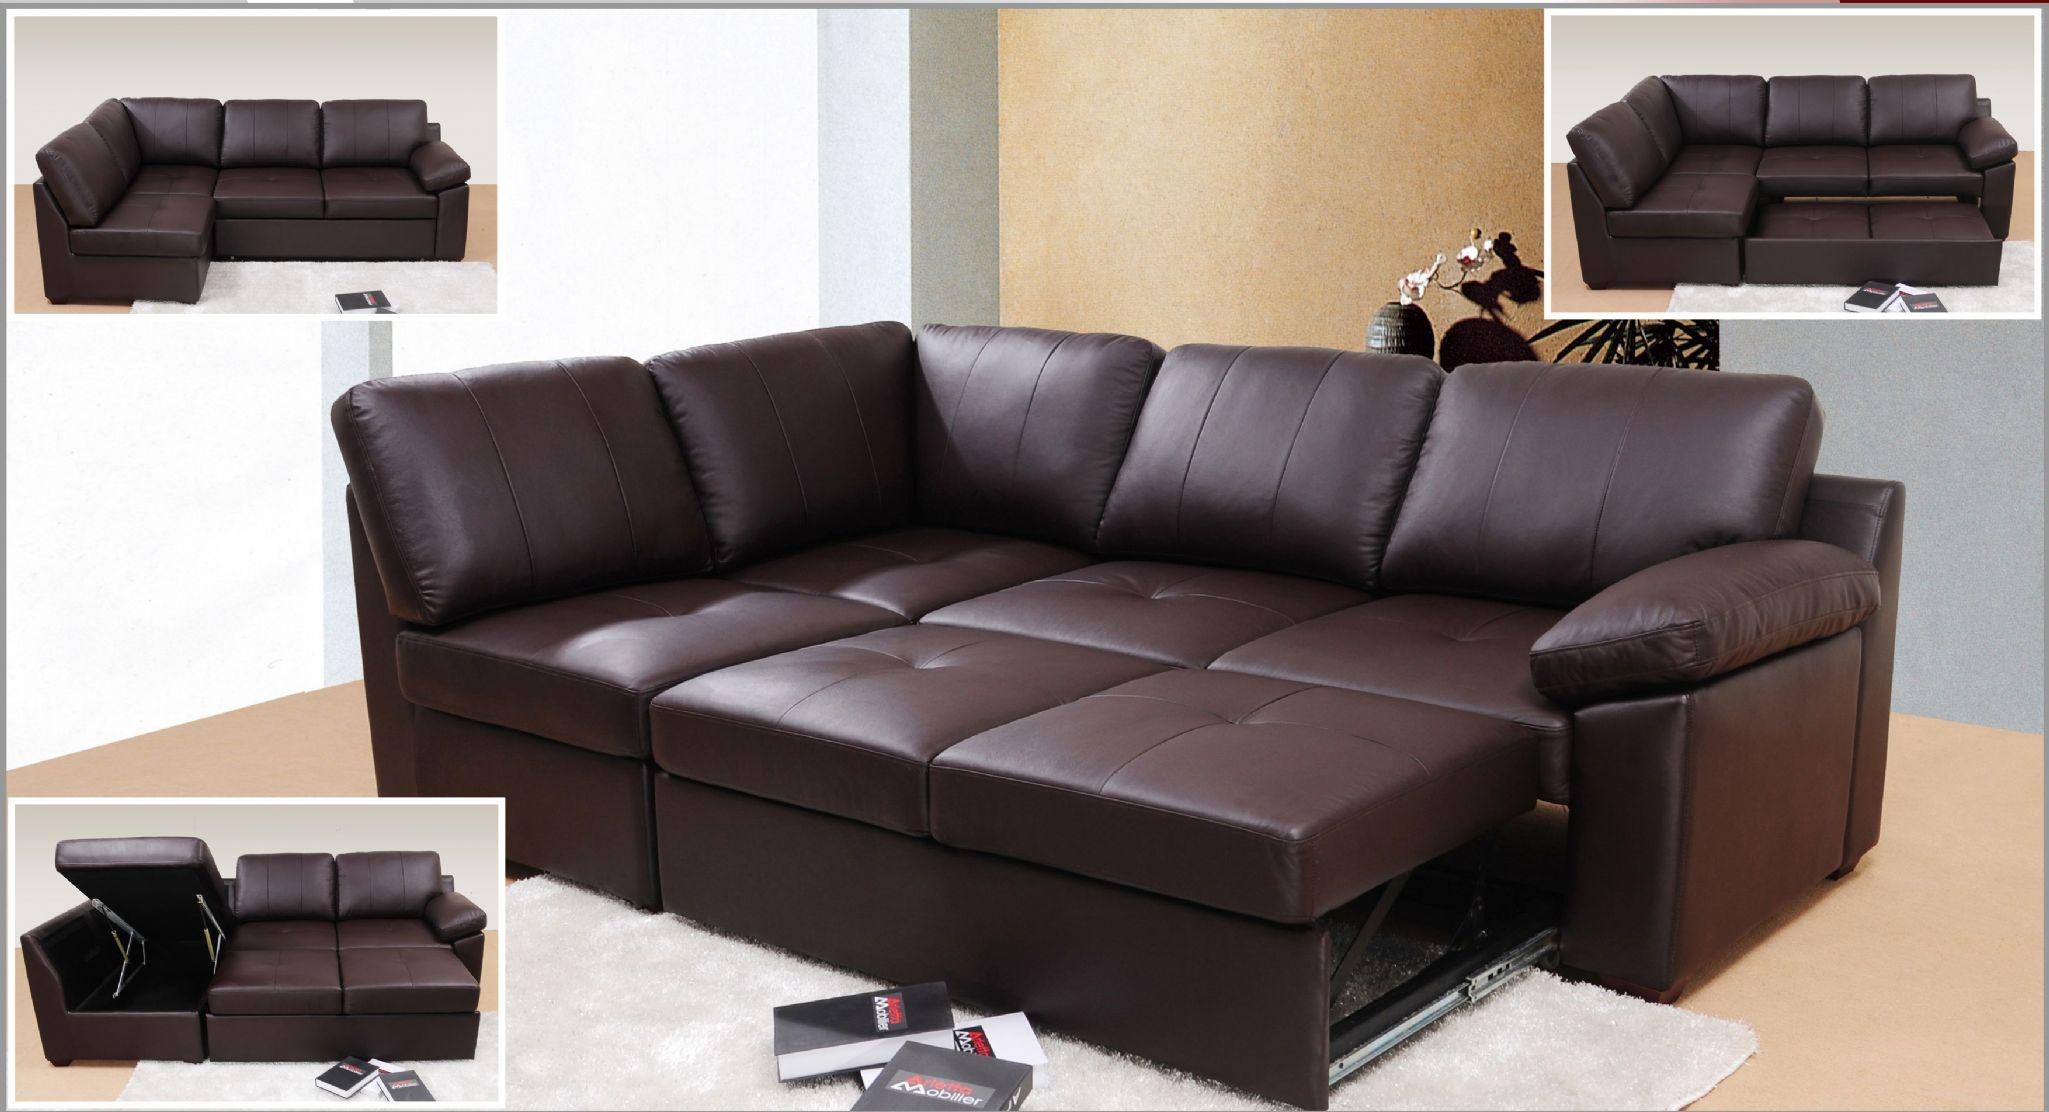 Sofa Bed Leather Corner Tehranmix Decoration Inside Corner Couch Bed (Image 15 of 15)